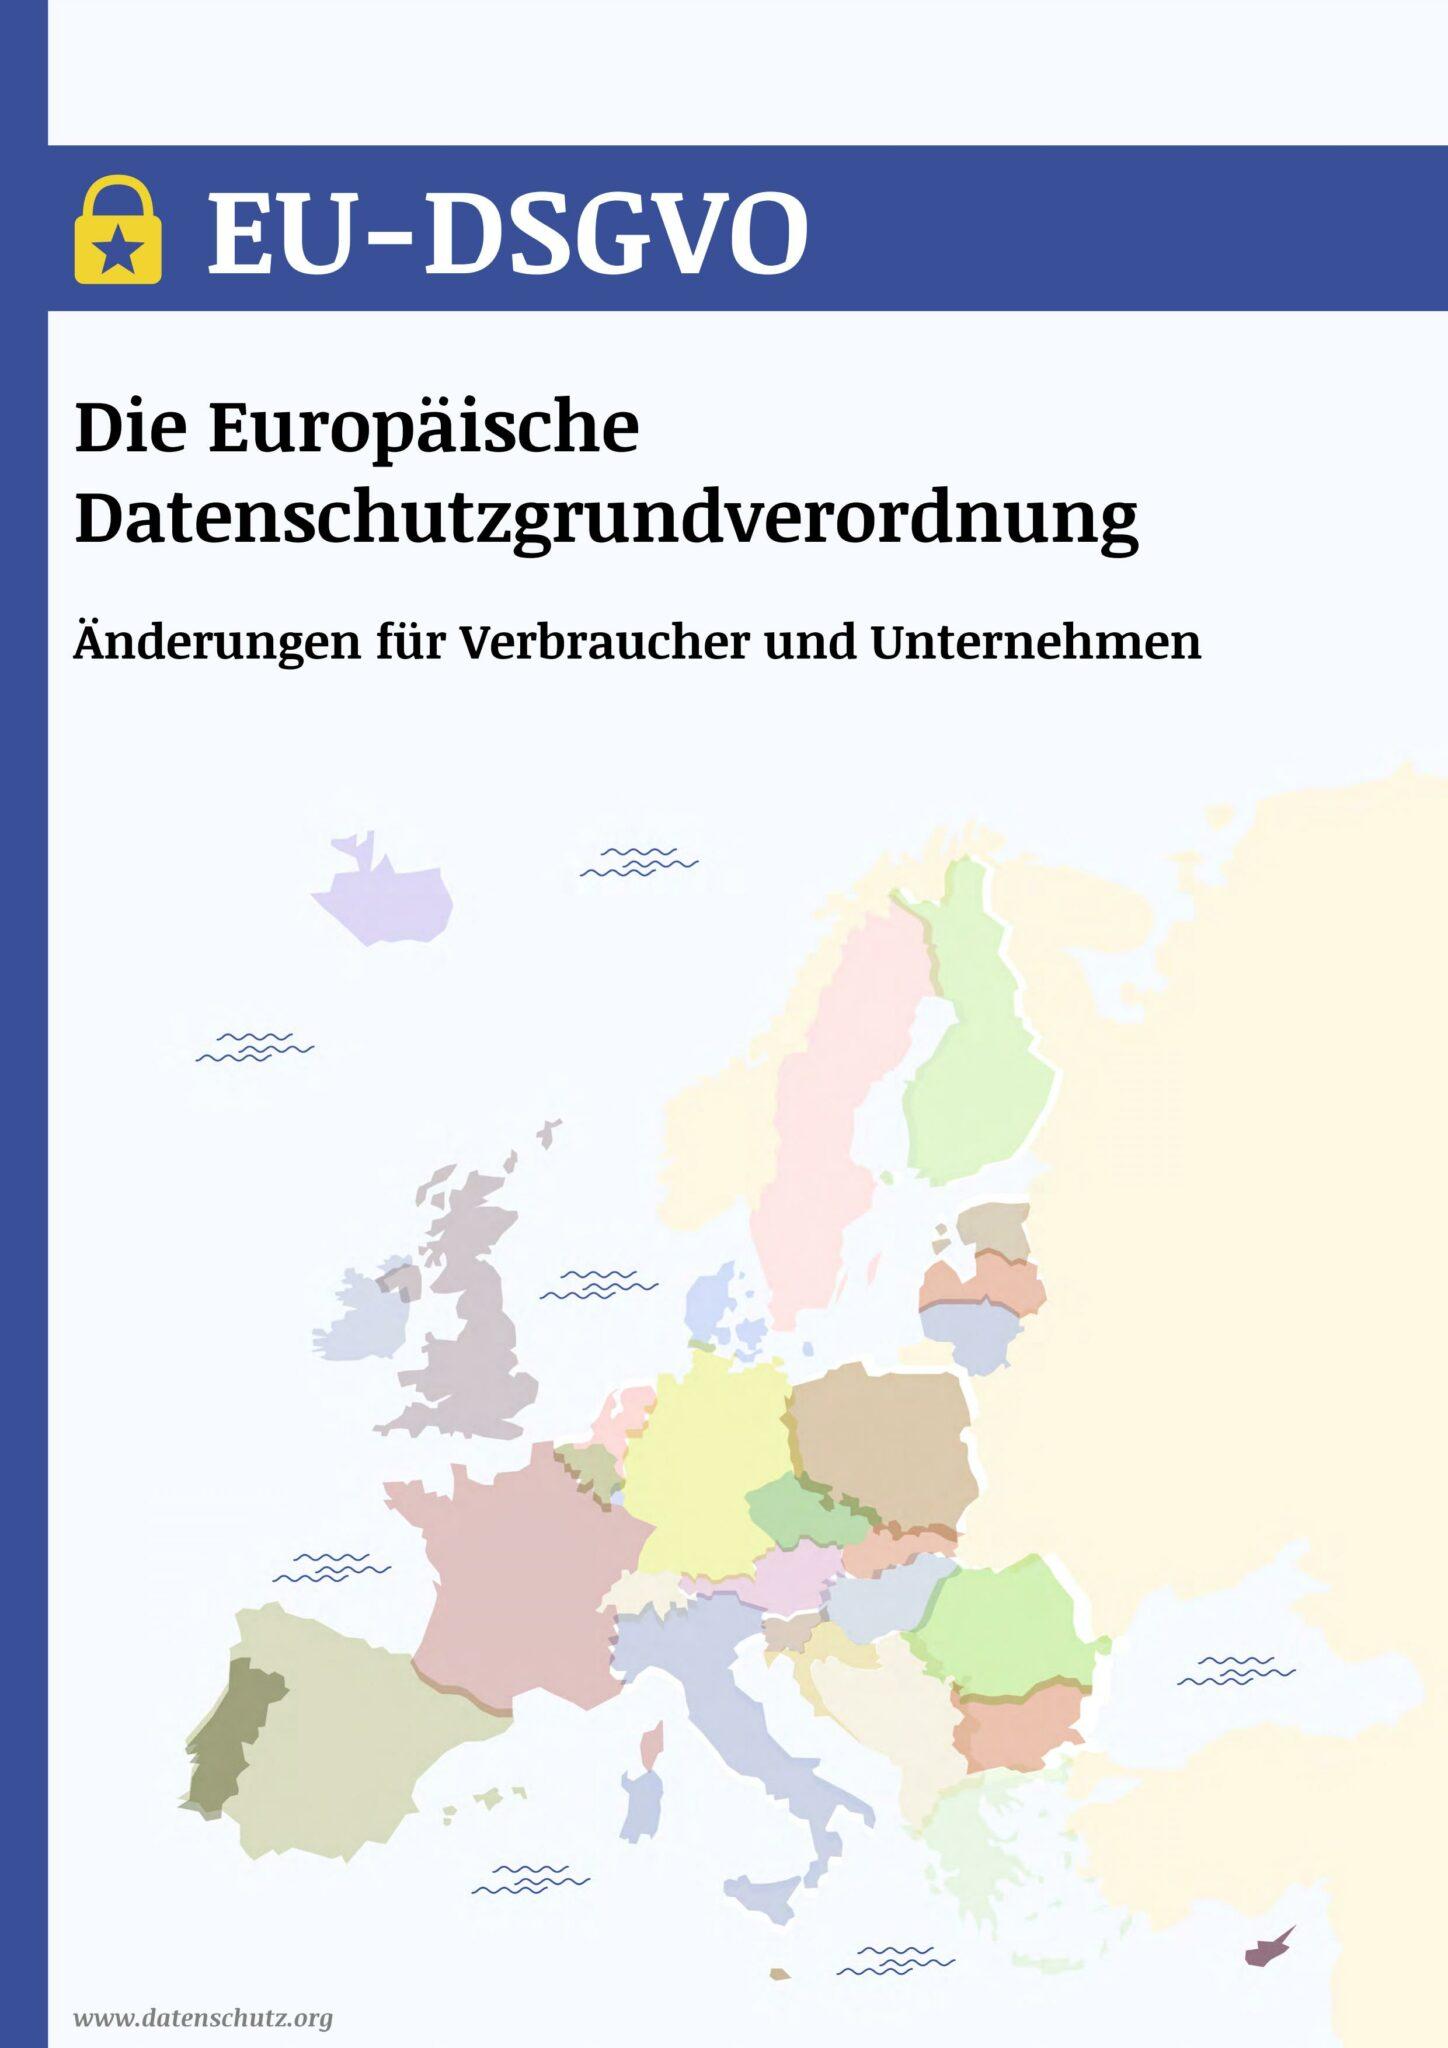 DSGVO: EU-Datenschutzgrundverordnung | Datenschutz 2018